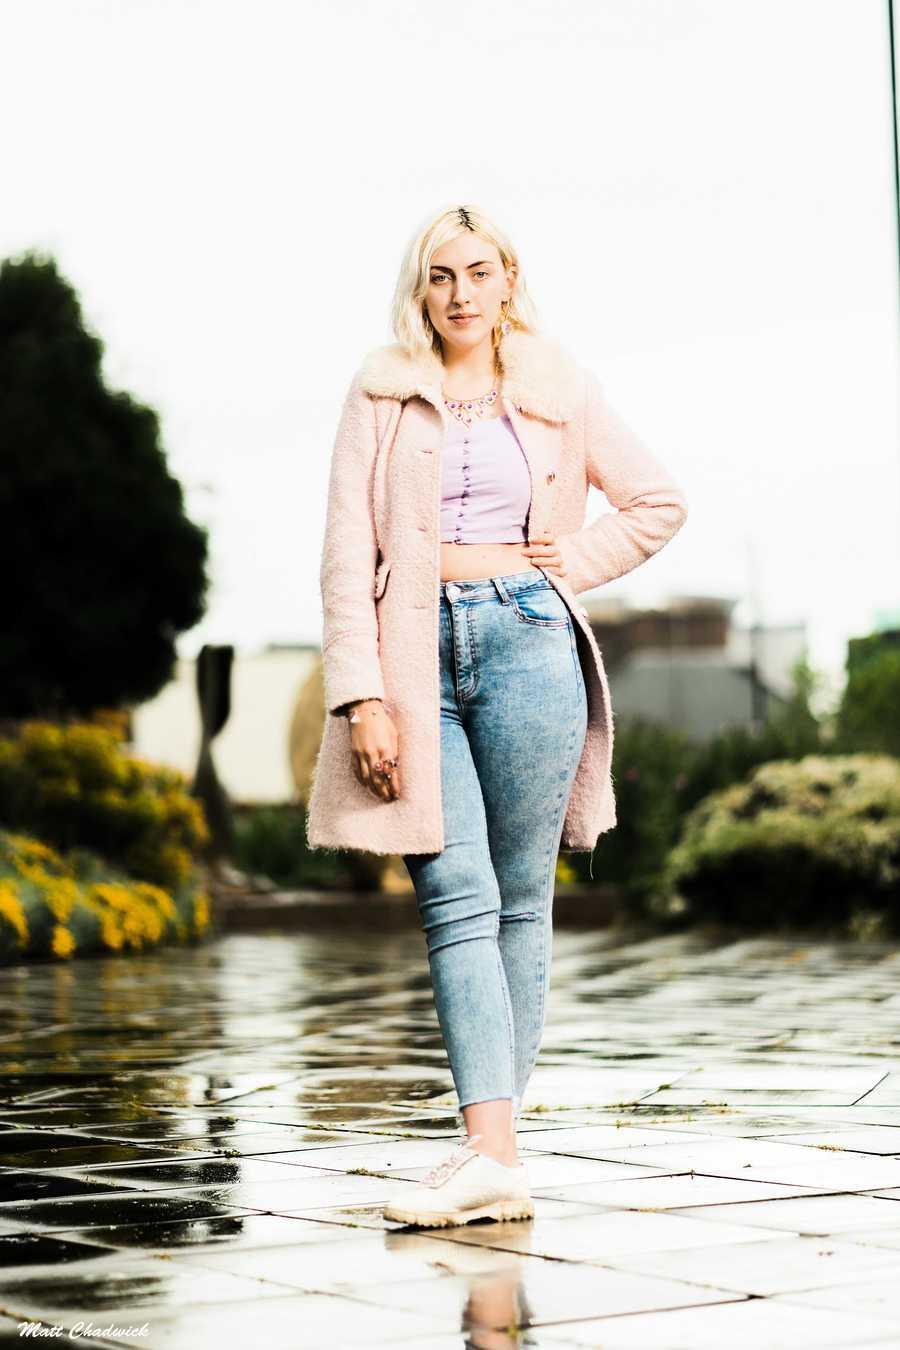 Photography by Matt Chadwick, Model Sophie-Jane / Uploaded 10th July 2019 @ 08:15 PM